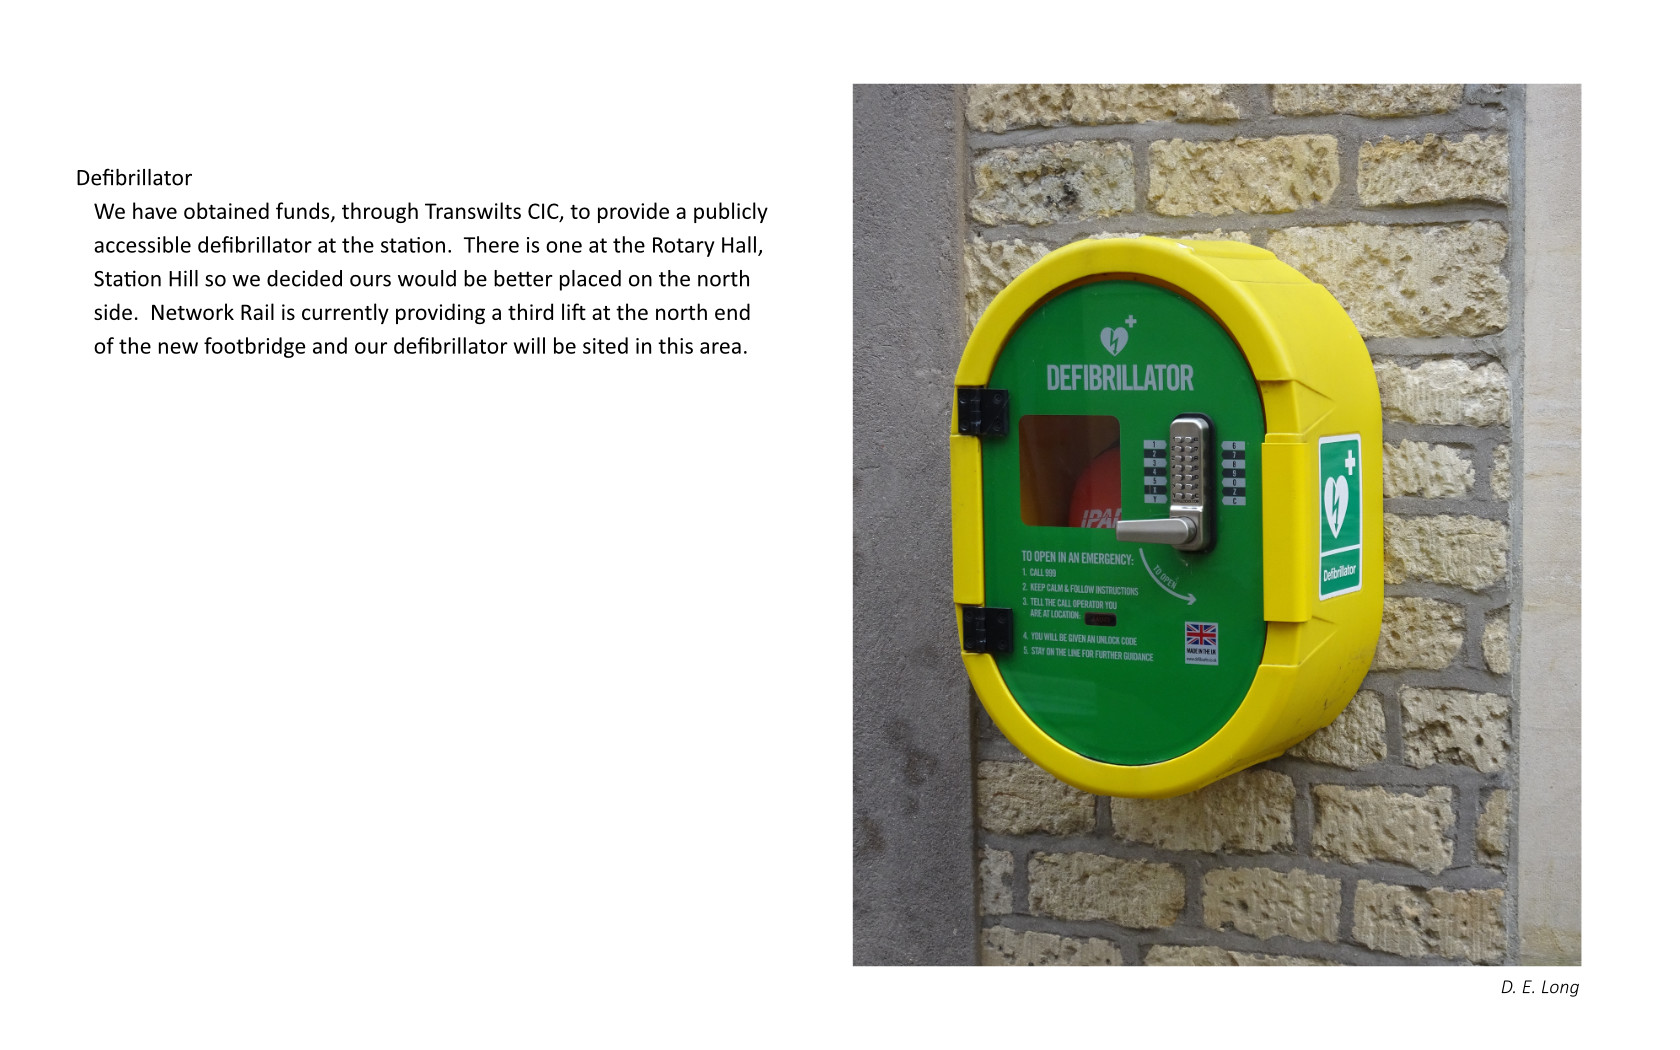 Includes image of a defibrillator